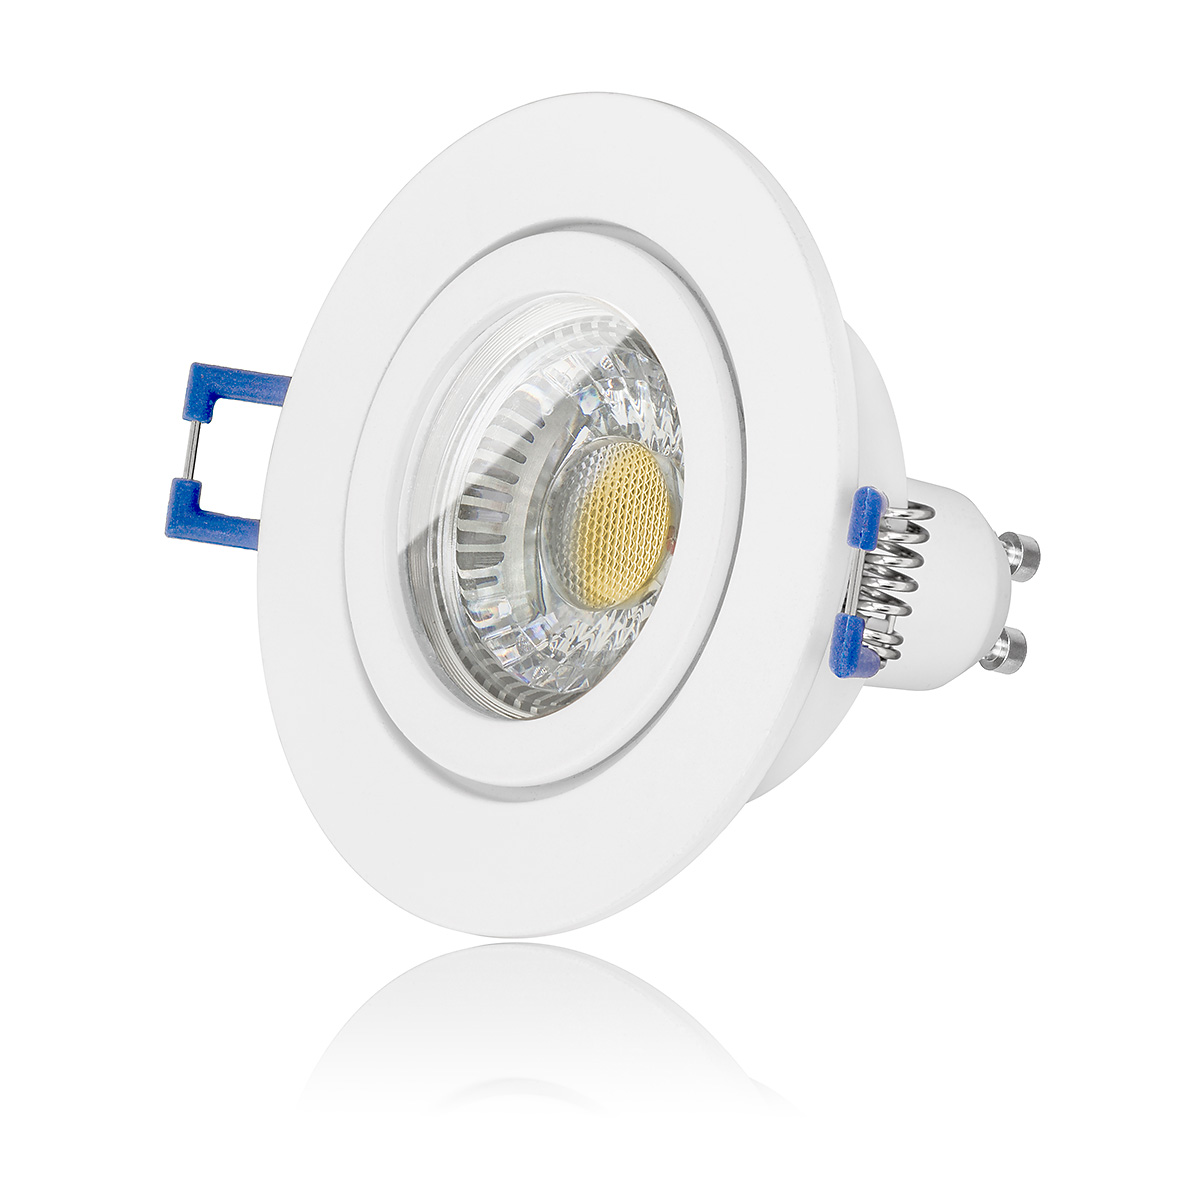 led set einbau strahler ip44 lampen aluminium weiss 2700 kelvin warmwei 6w led gu10 450 lumen. Black Bedroom Furniture Sets. Home Design Ideas